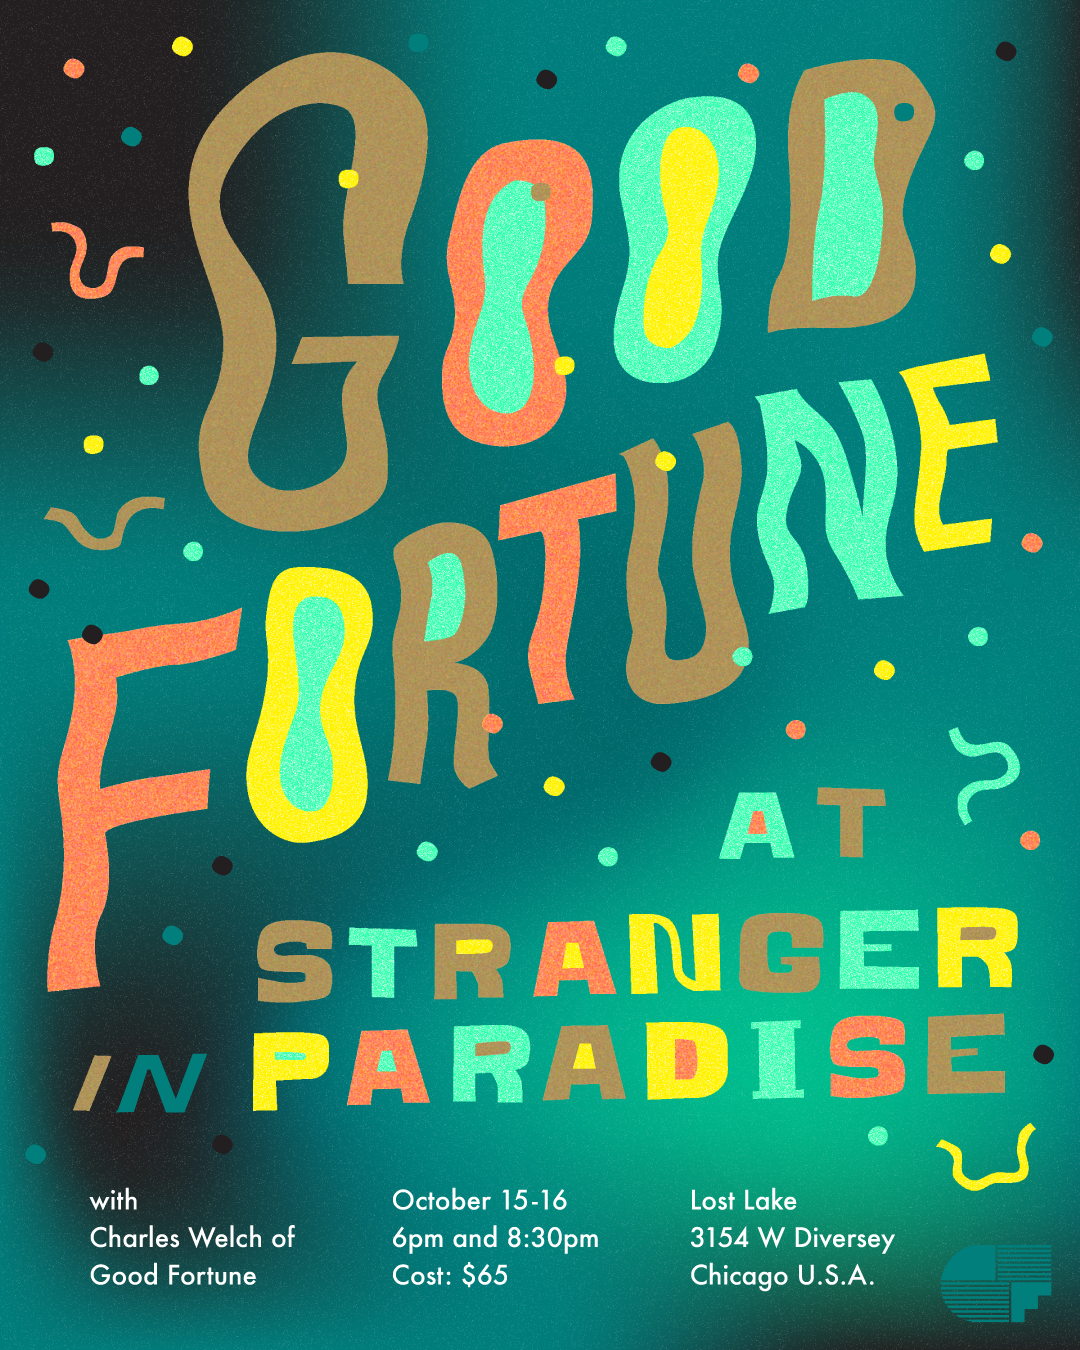 good-fortune-at-sip-3.png